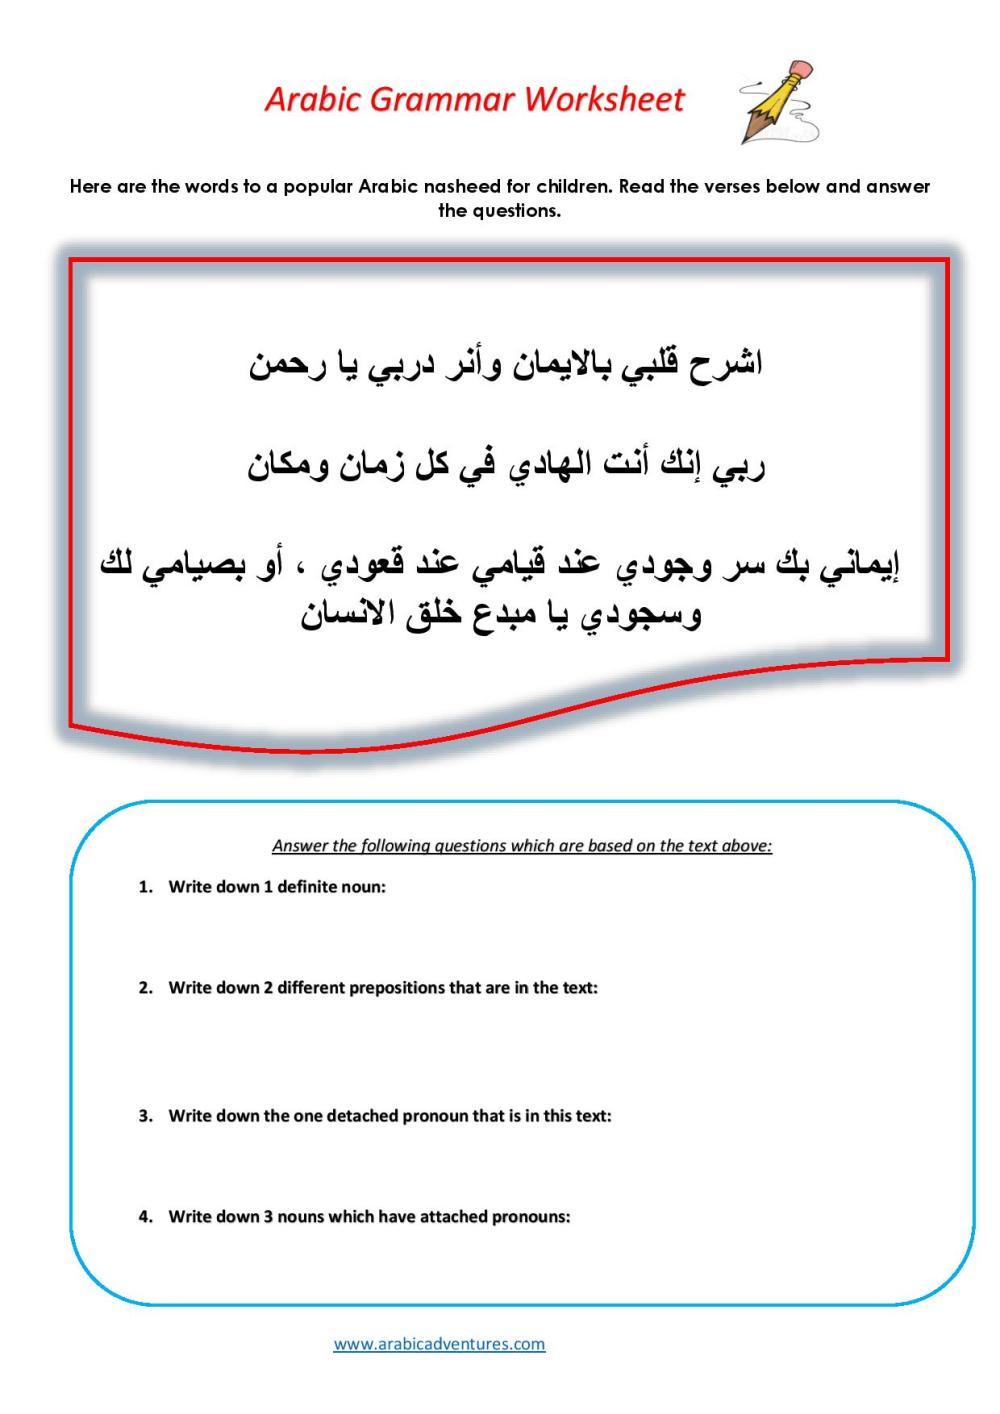 medium resolution of detached pronouns arabic   Arabic Adventures